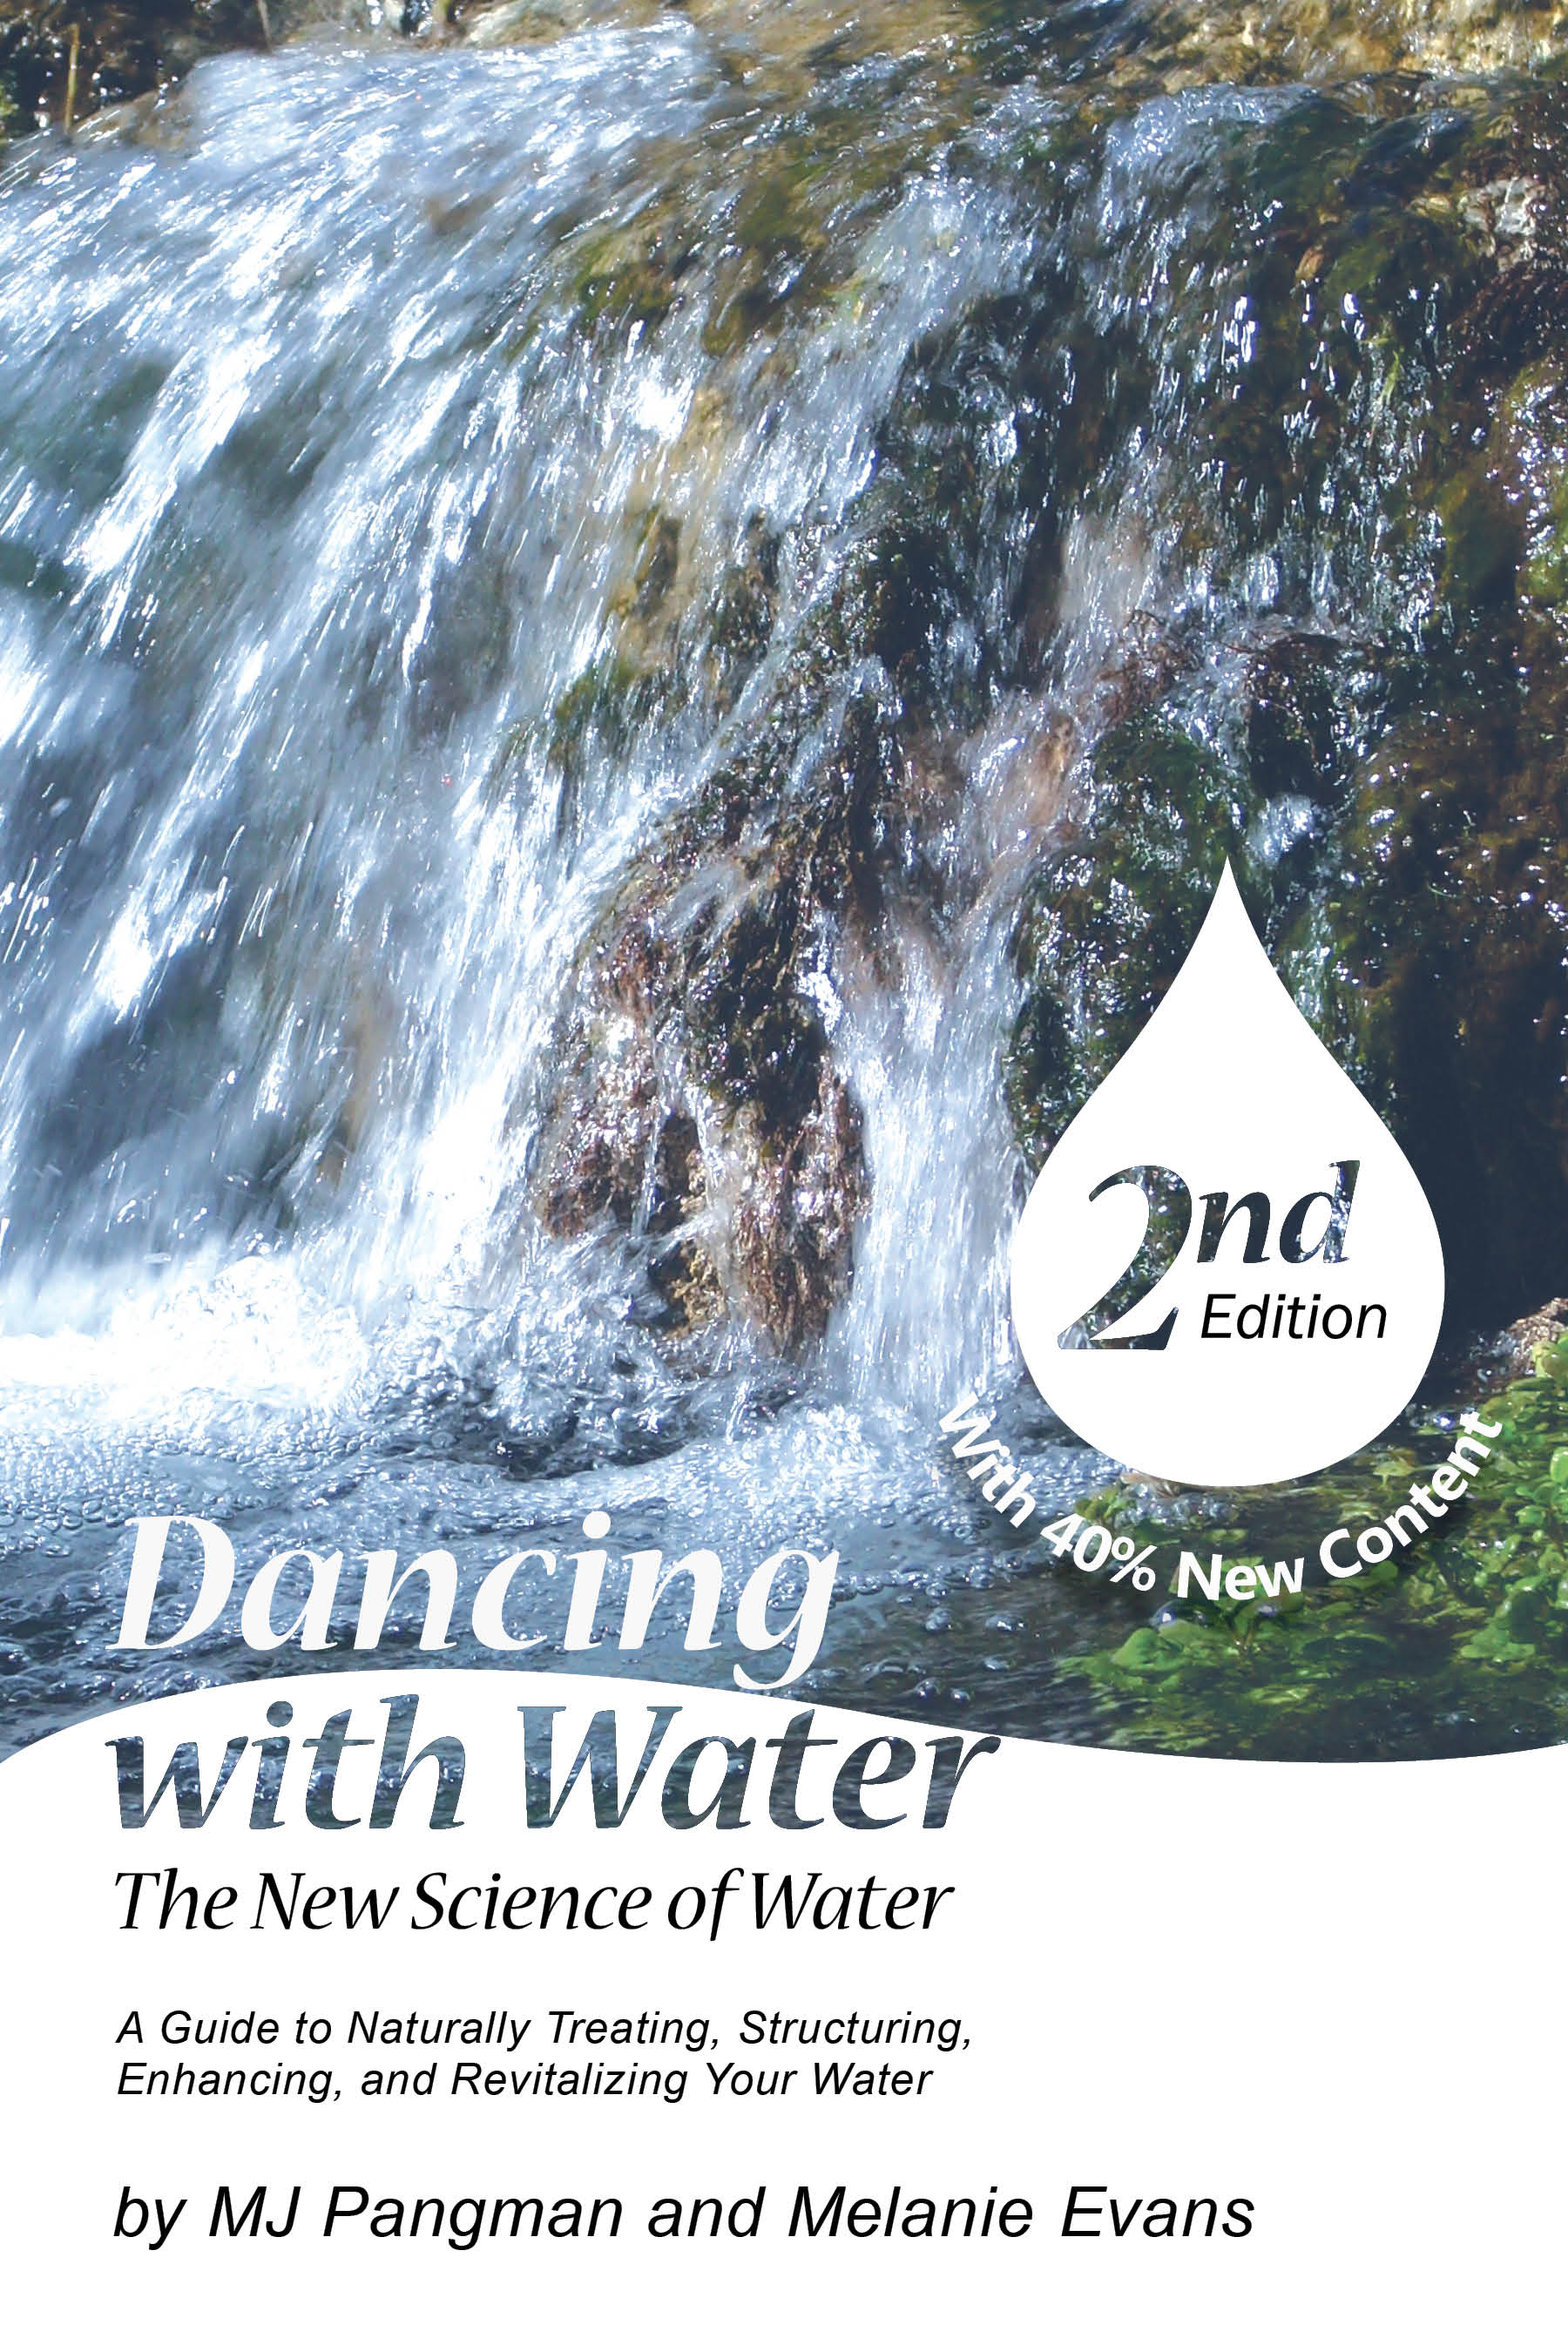 DWW-2nd-ed-cover.jpg